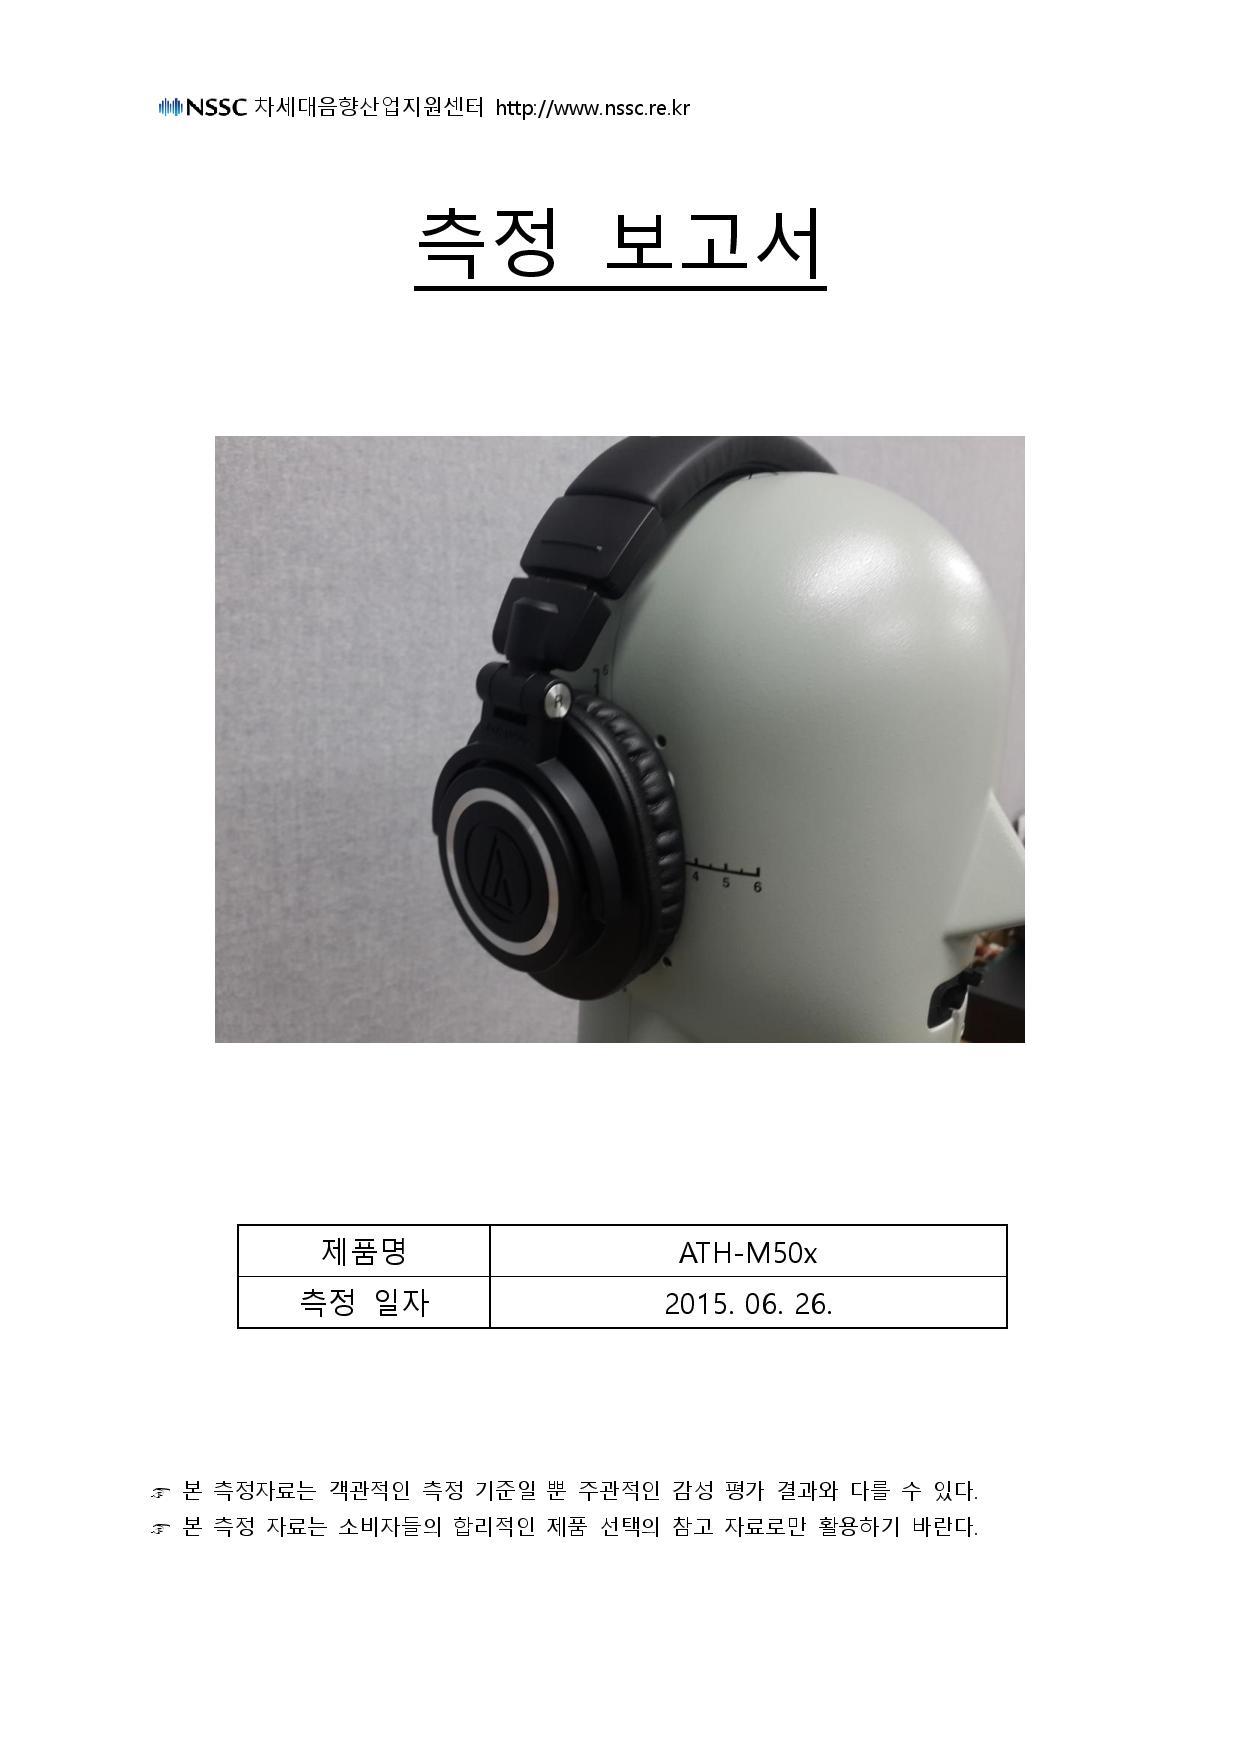 Audio-technica ATH-M50x-page-001.jpg